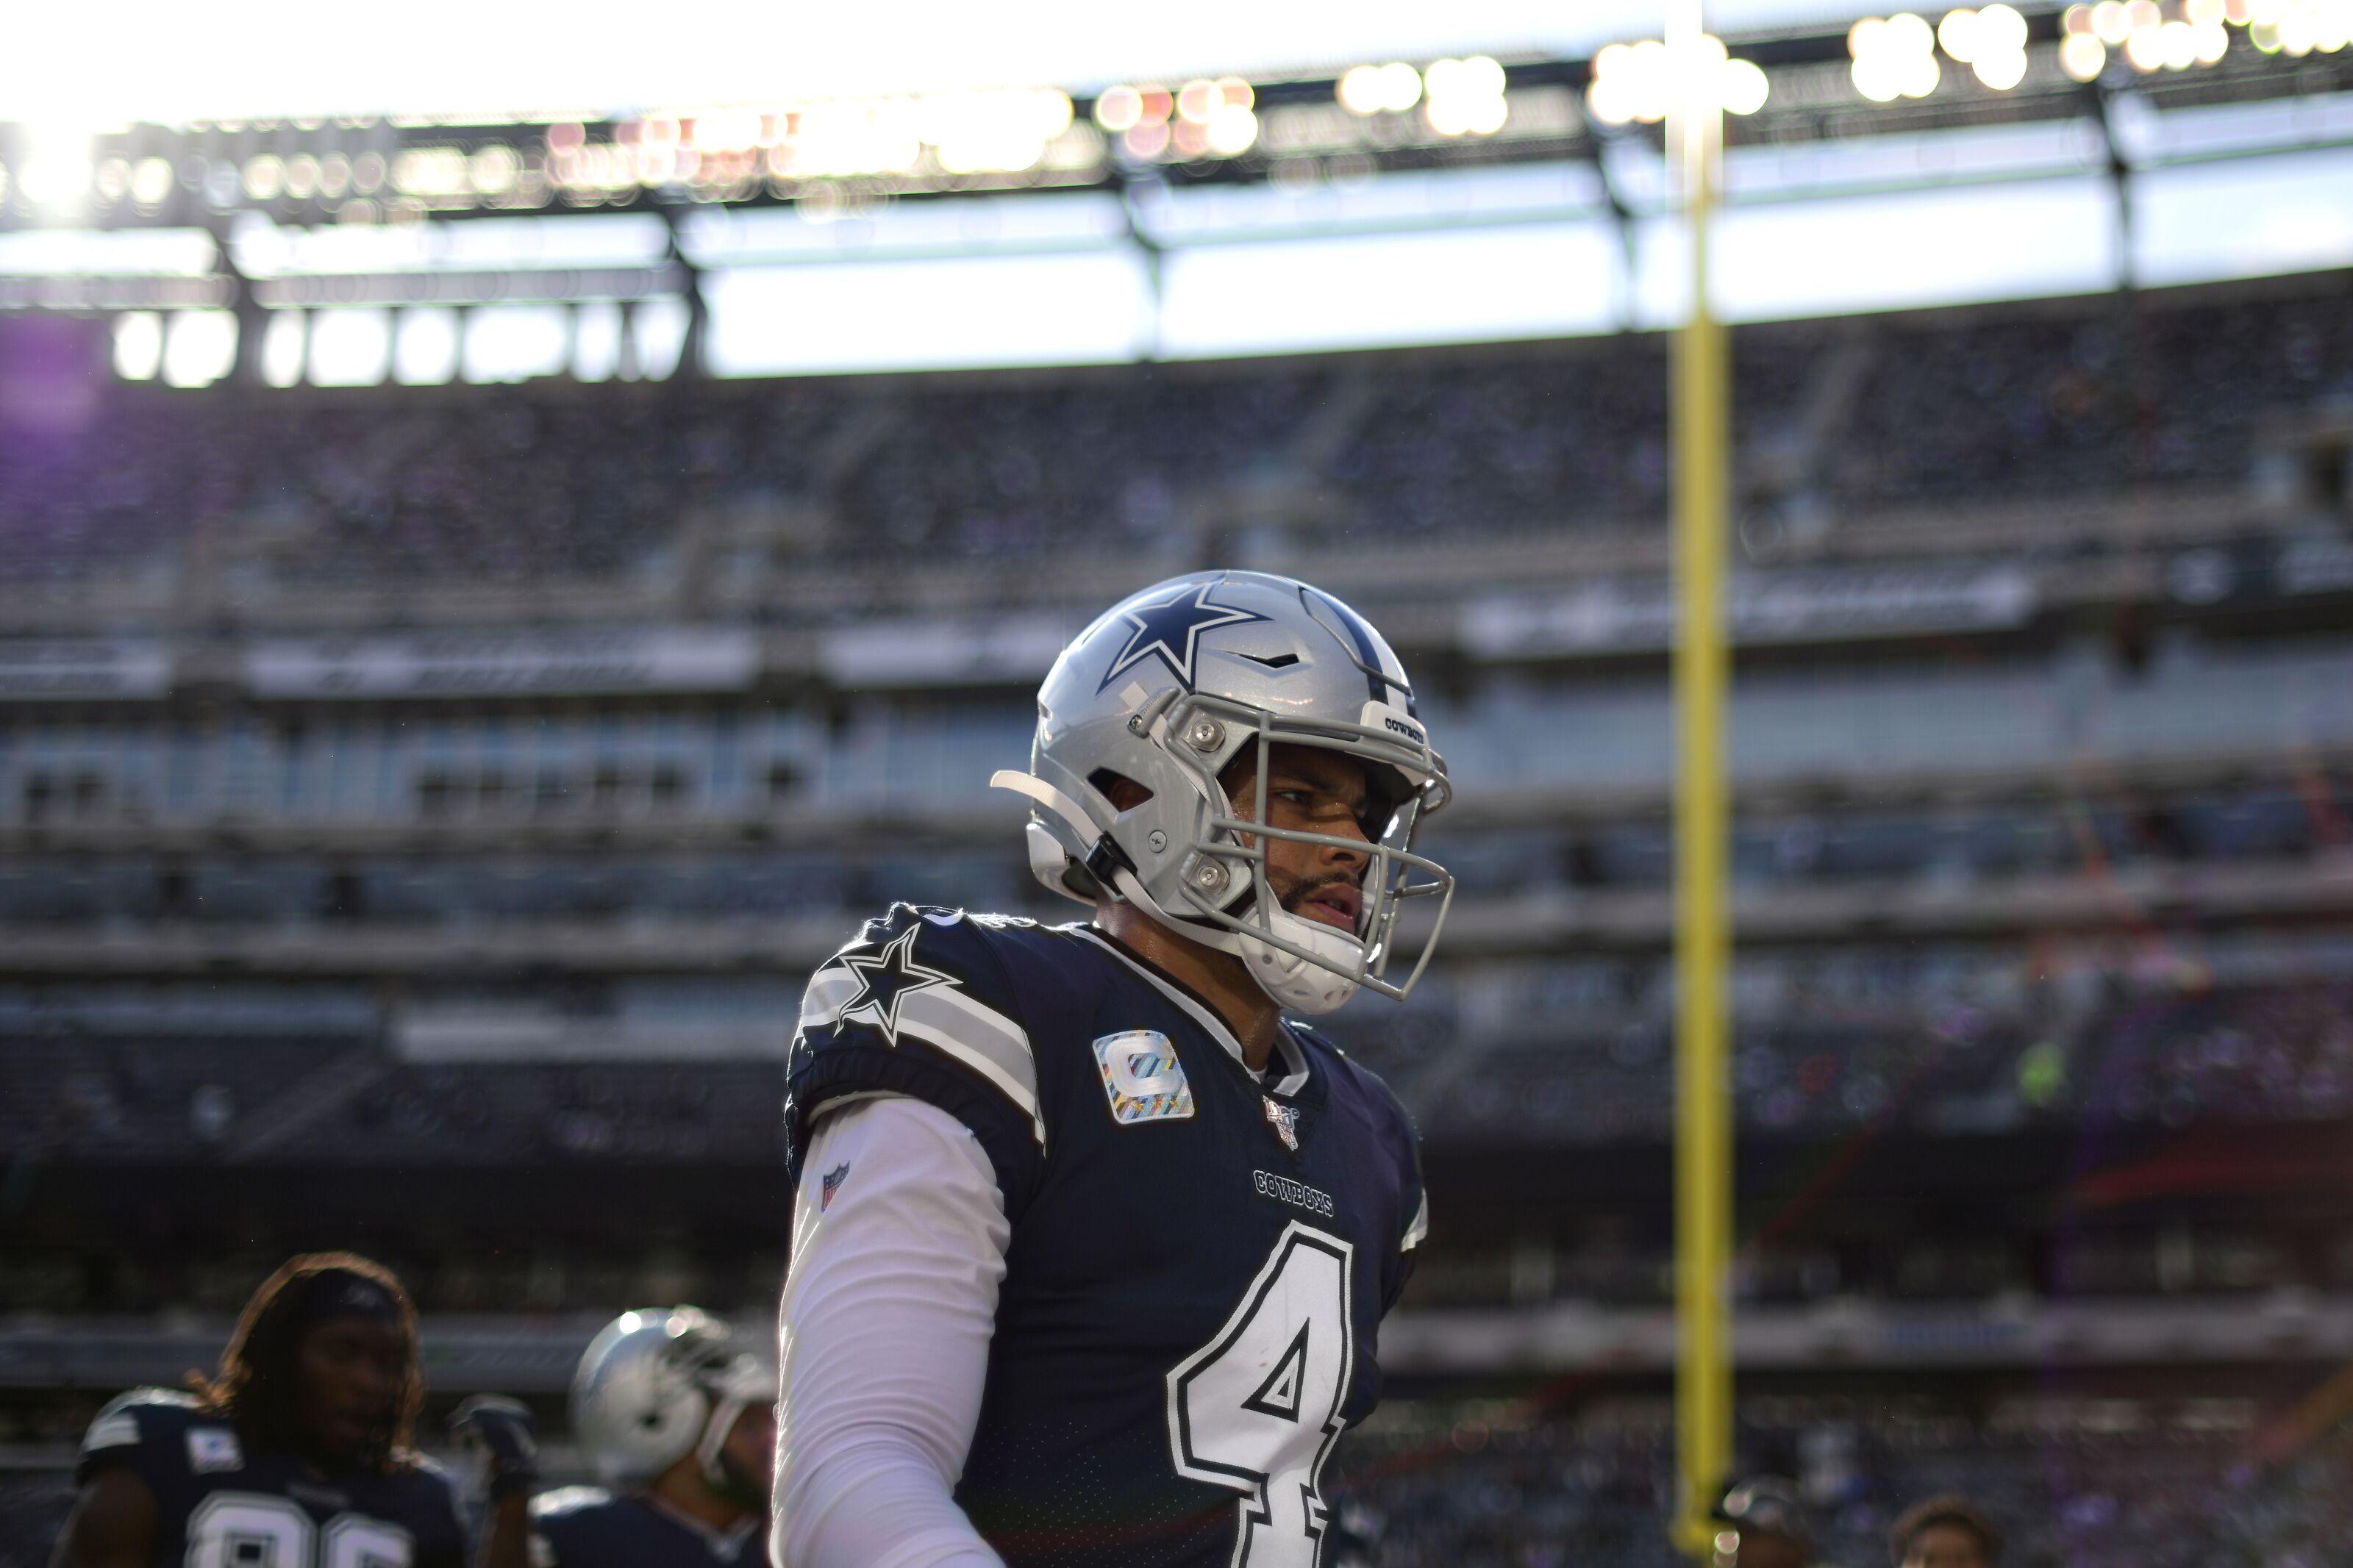 Should Dak Prescott call out Dallas Cowboys coaching staff?